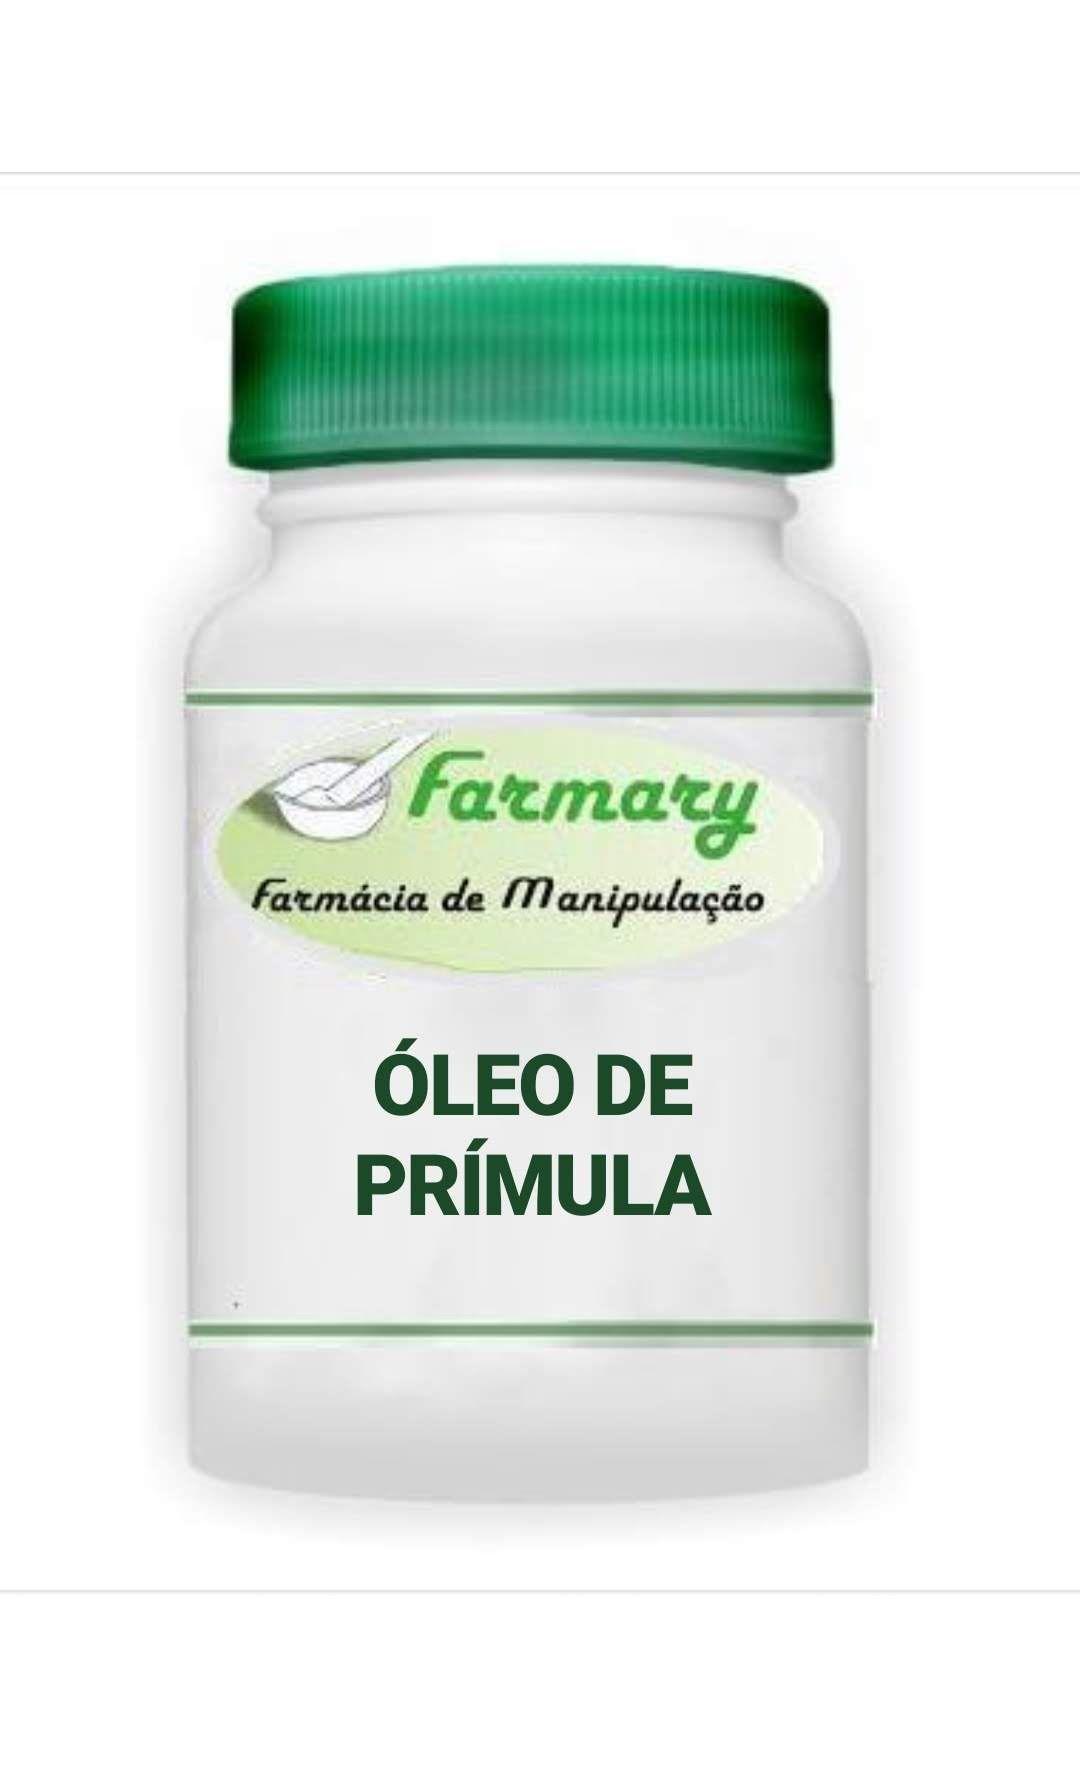 OLEO DE PRIMULA